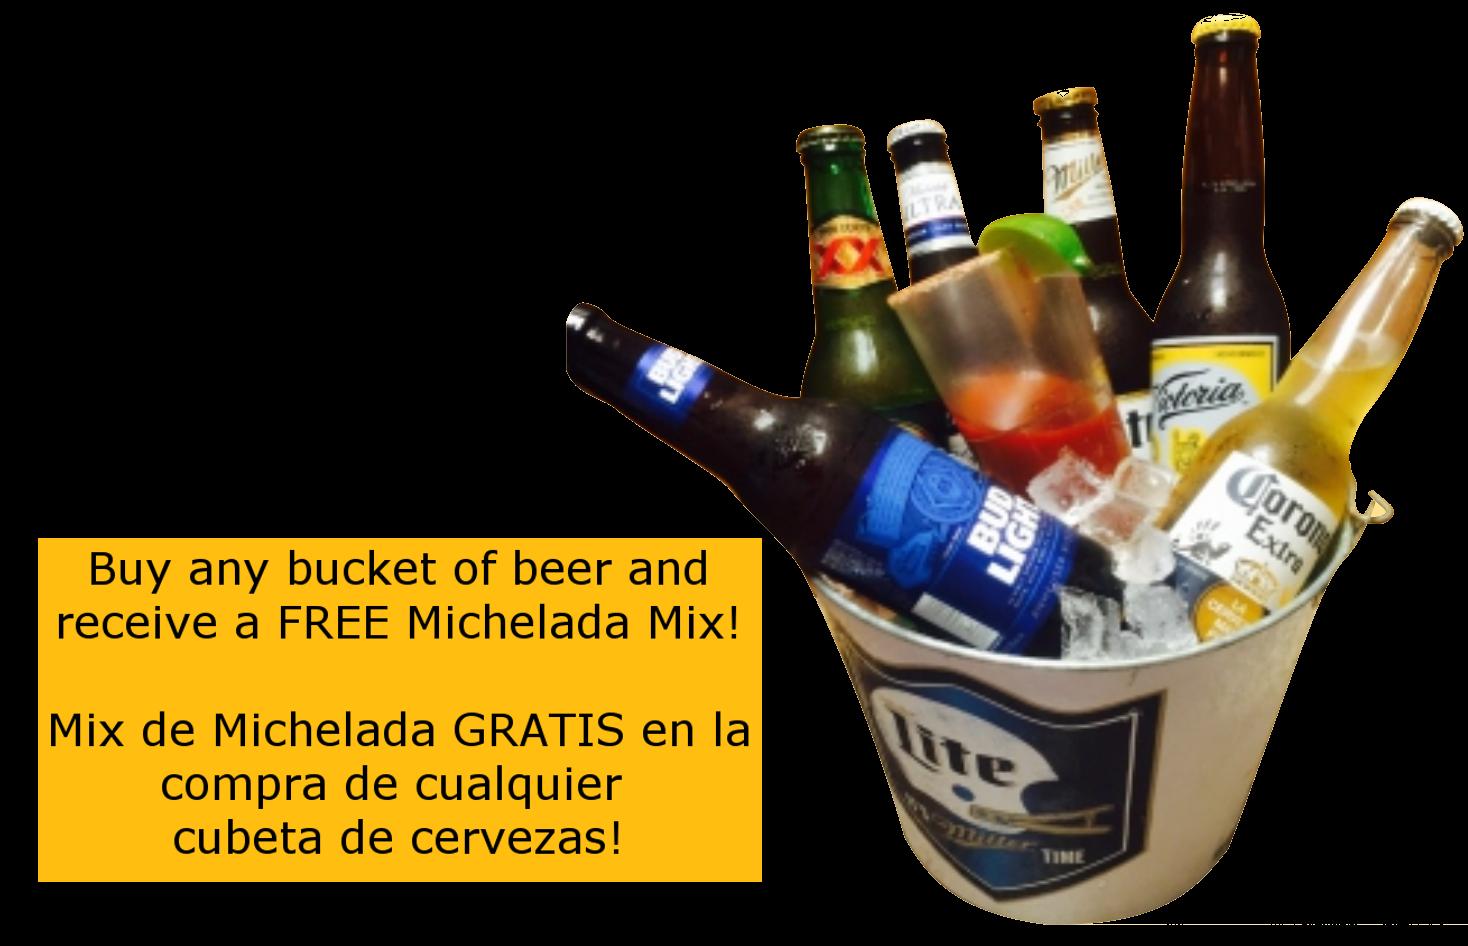 beerbucketmodifiedreal.png